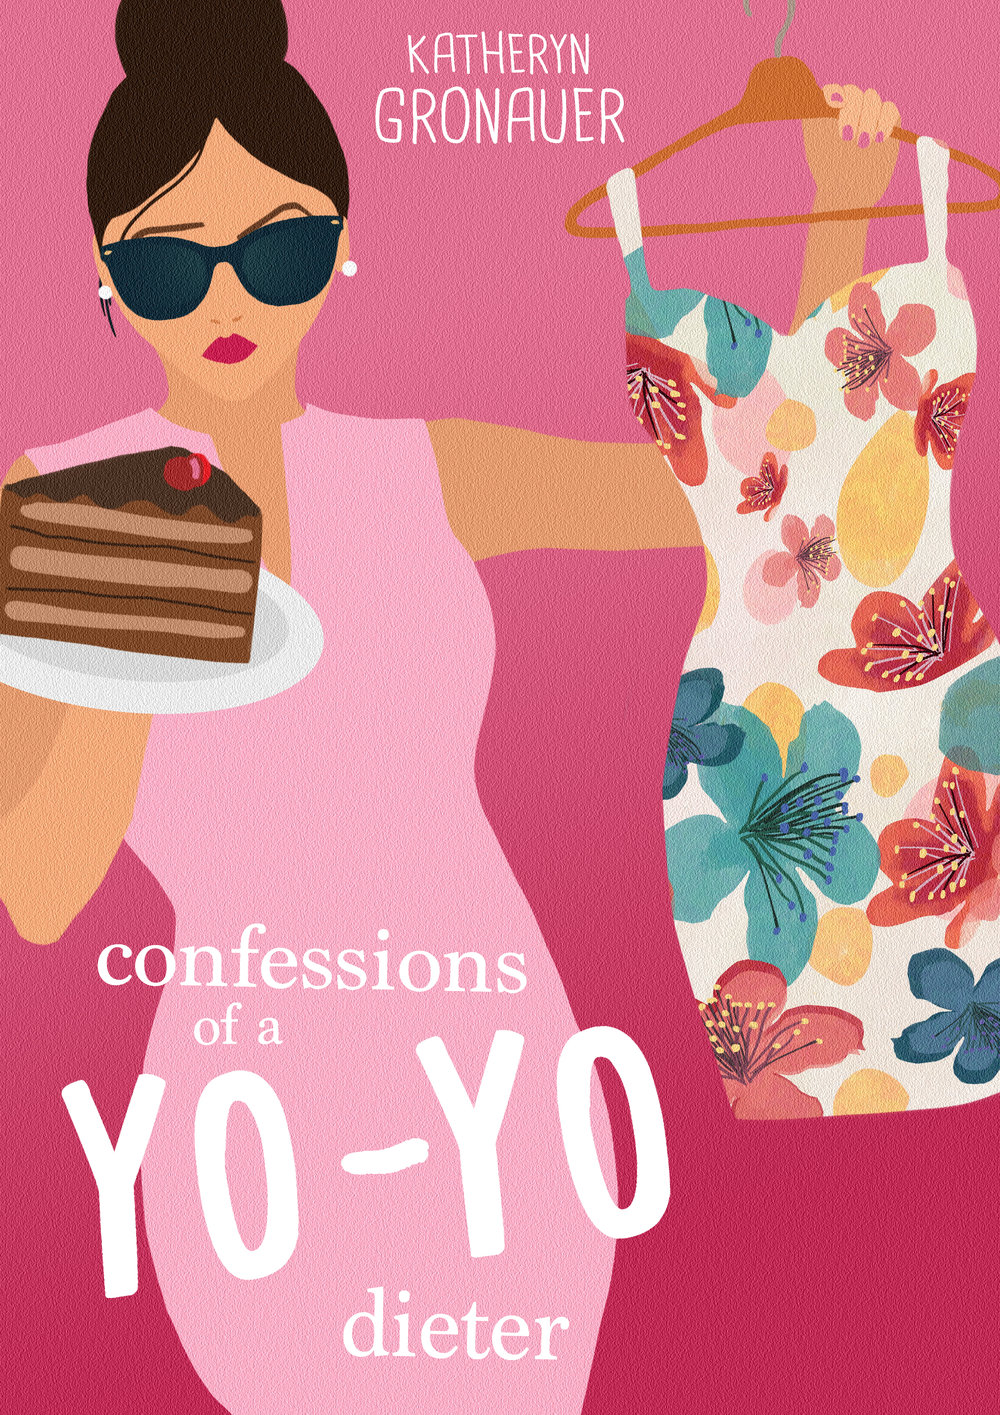 Confessions of a Yo-yo Dieter Cover